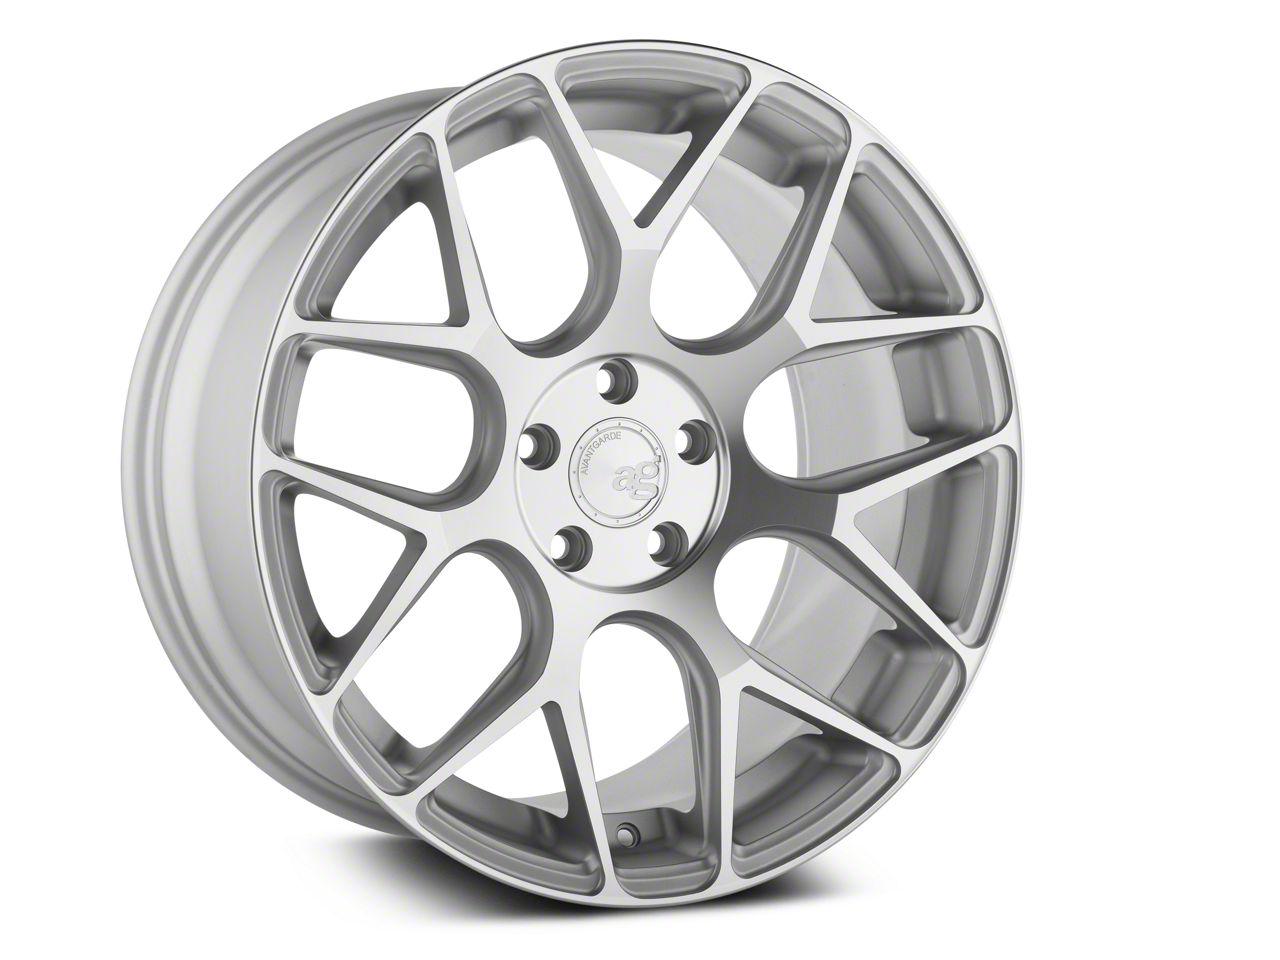 avant garde mustang m590 satin silver wheel 20x10 m590 05 Mustang GT Seats avant garde mustang m590 satin silver wheel 20x10 m590 msm514201043 05 14 all